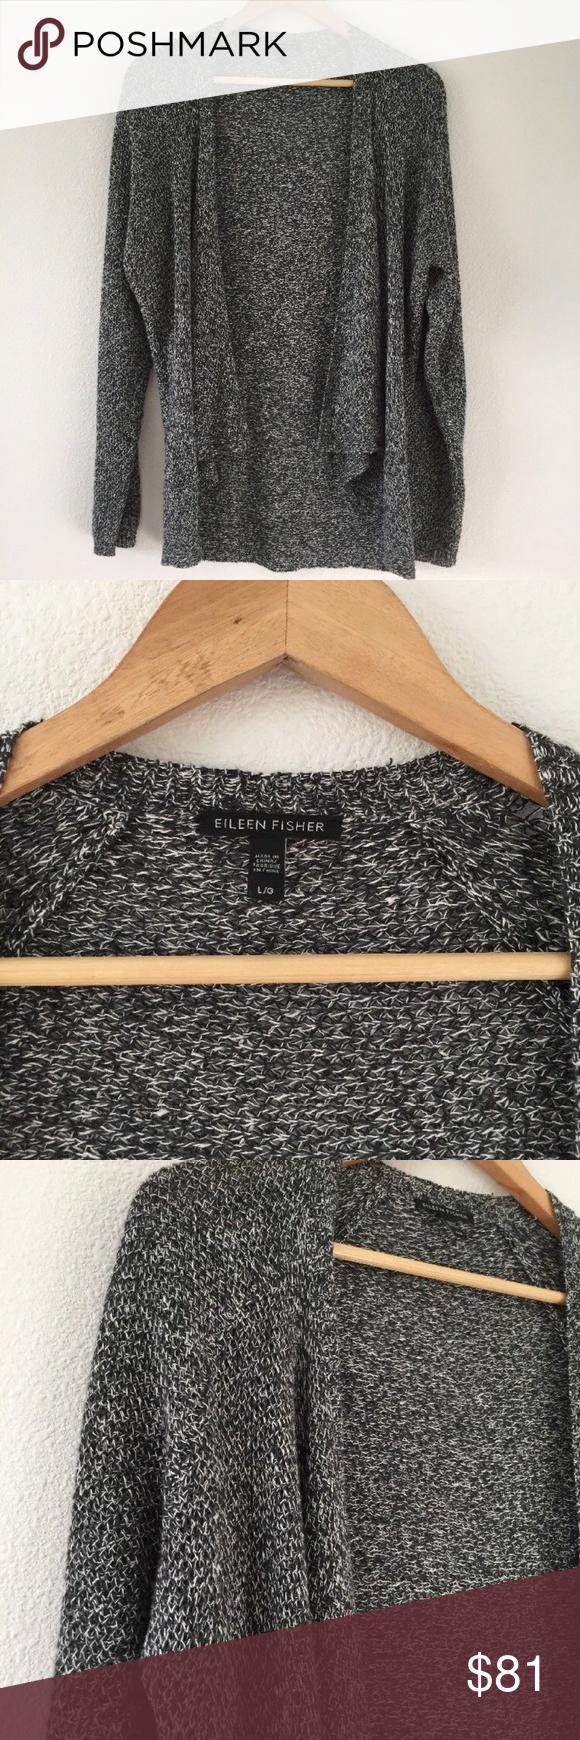 92e2ccf72ed3a0 Gray Black White Open Organic Cotton Knit Sweater Brand  Eileen Fisher  Style  Cardigan Size (Women s)  L Material  Organic Cotton Size Type   Regular ...